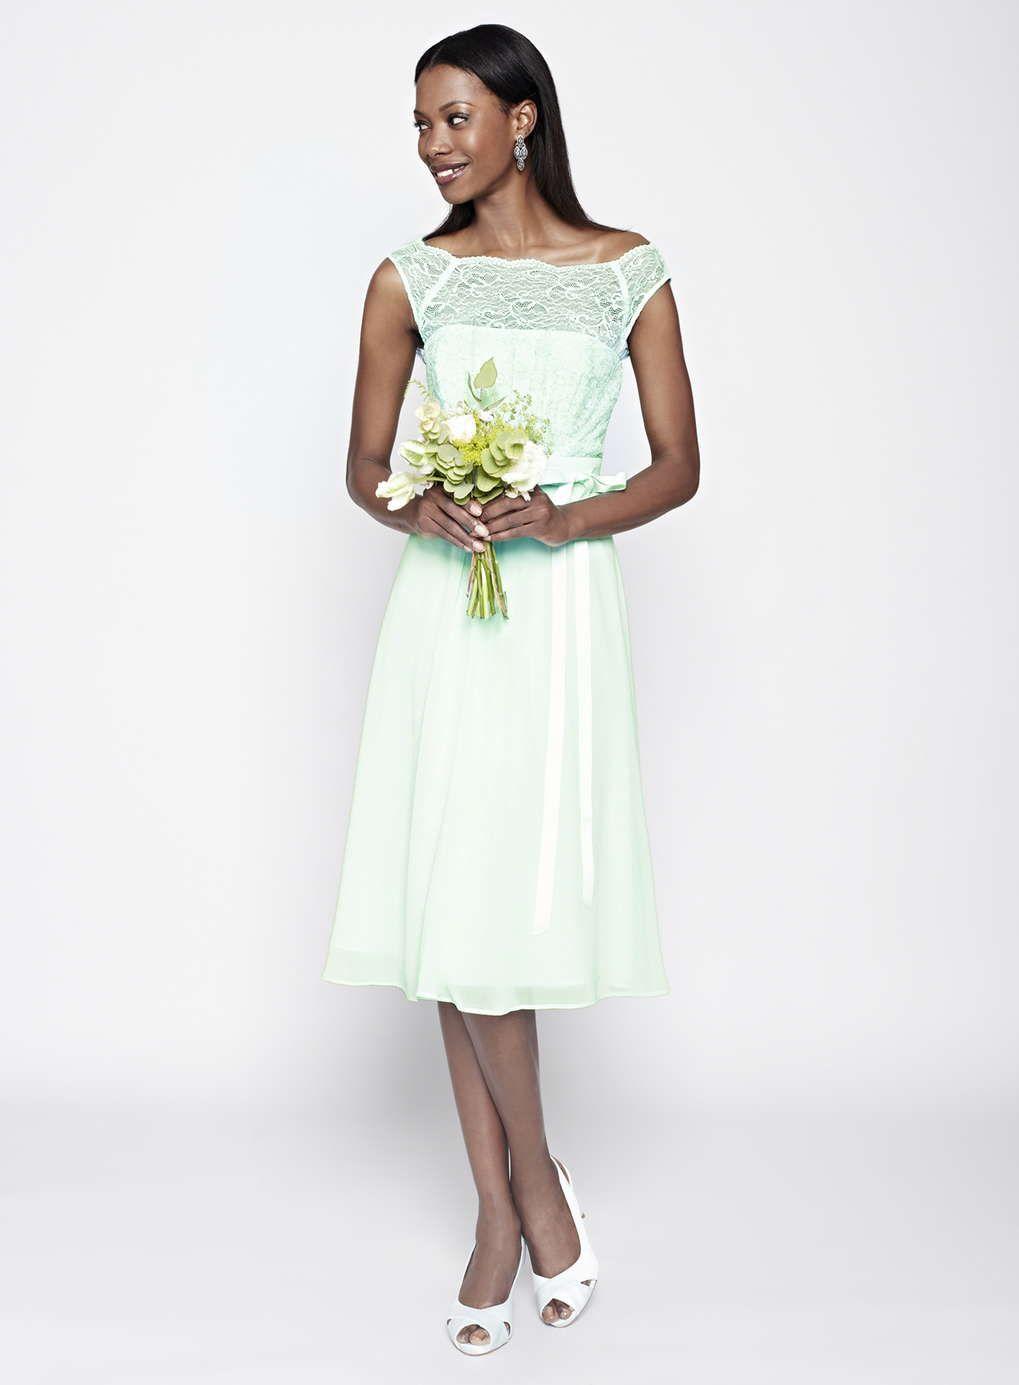 Light mint chloe bridesmaid dress bridesmaid dresses pinterest light mint chloe bridesmaid dress ombrellifo Image collections